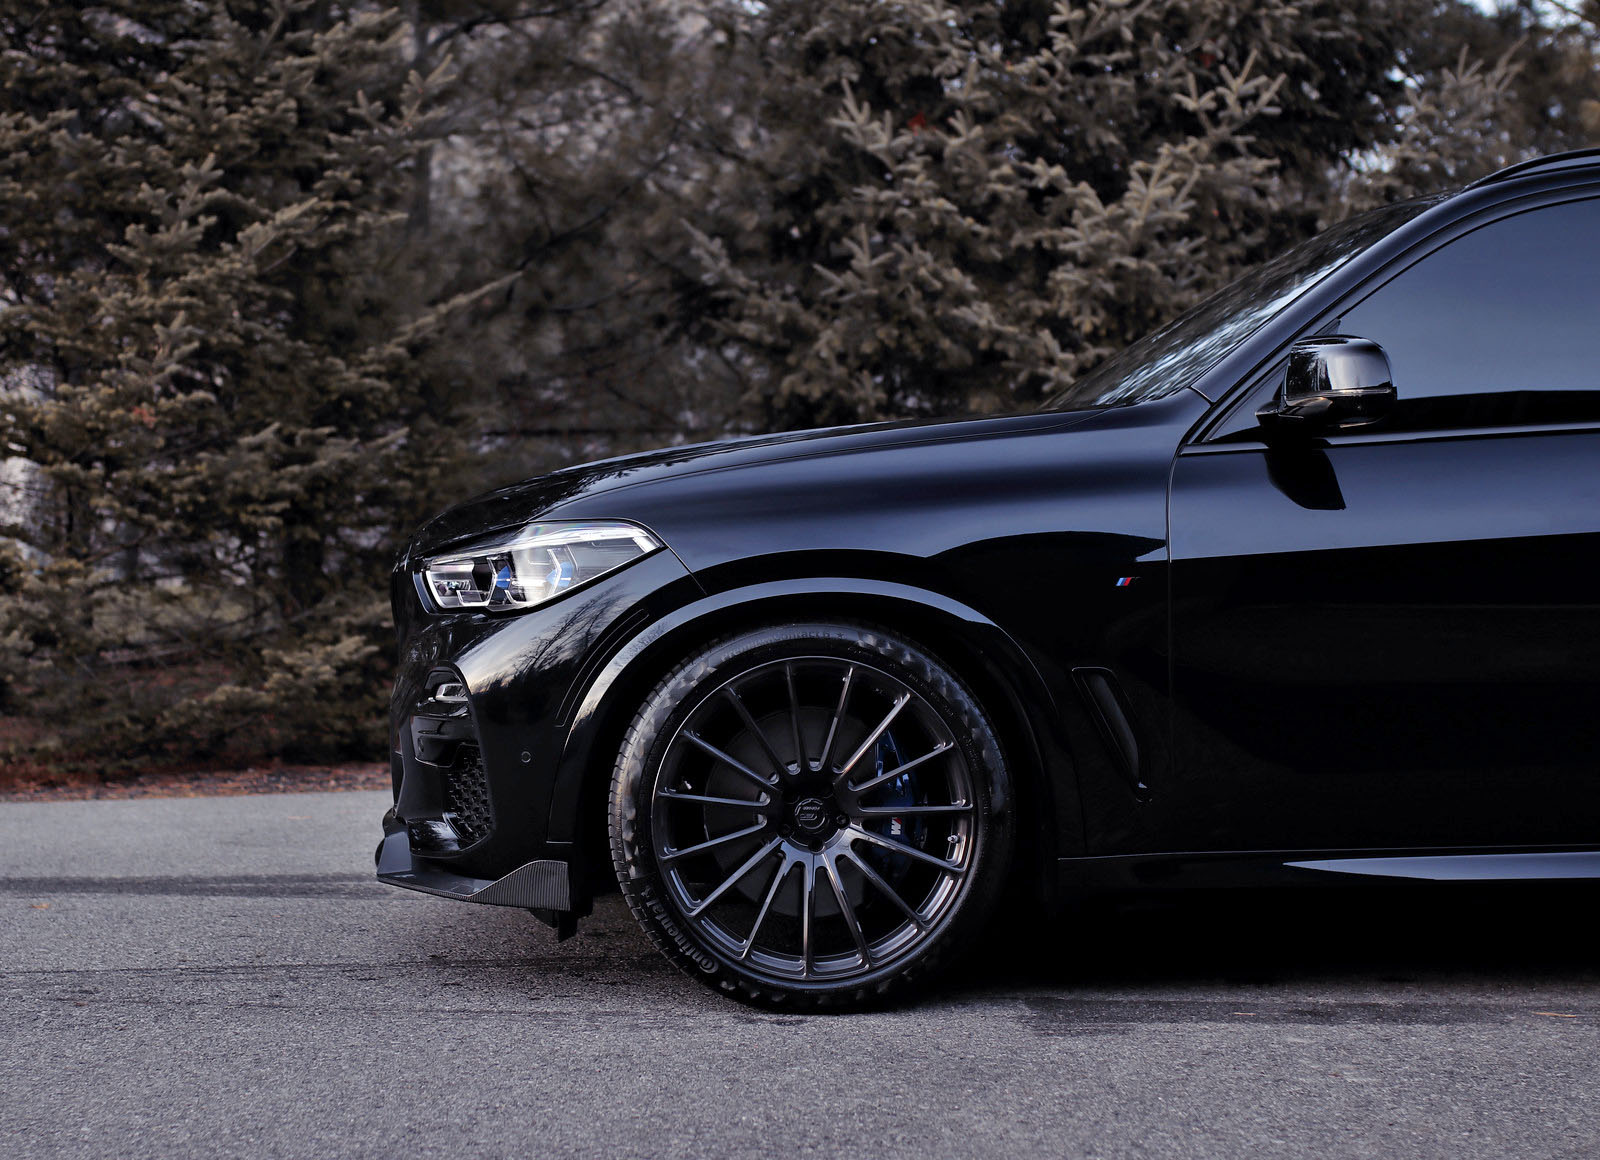 Name:  Modified-BMW-X5-G05-dubsesd-2.jpg Views: 11507 Size:  347.6 KB